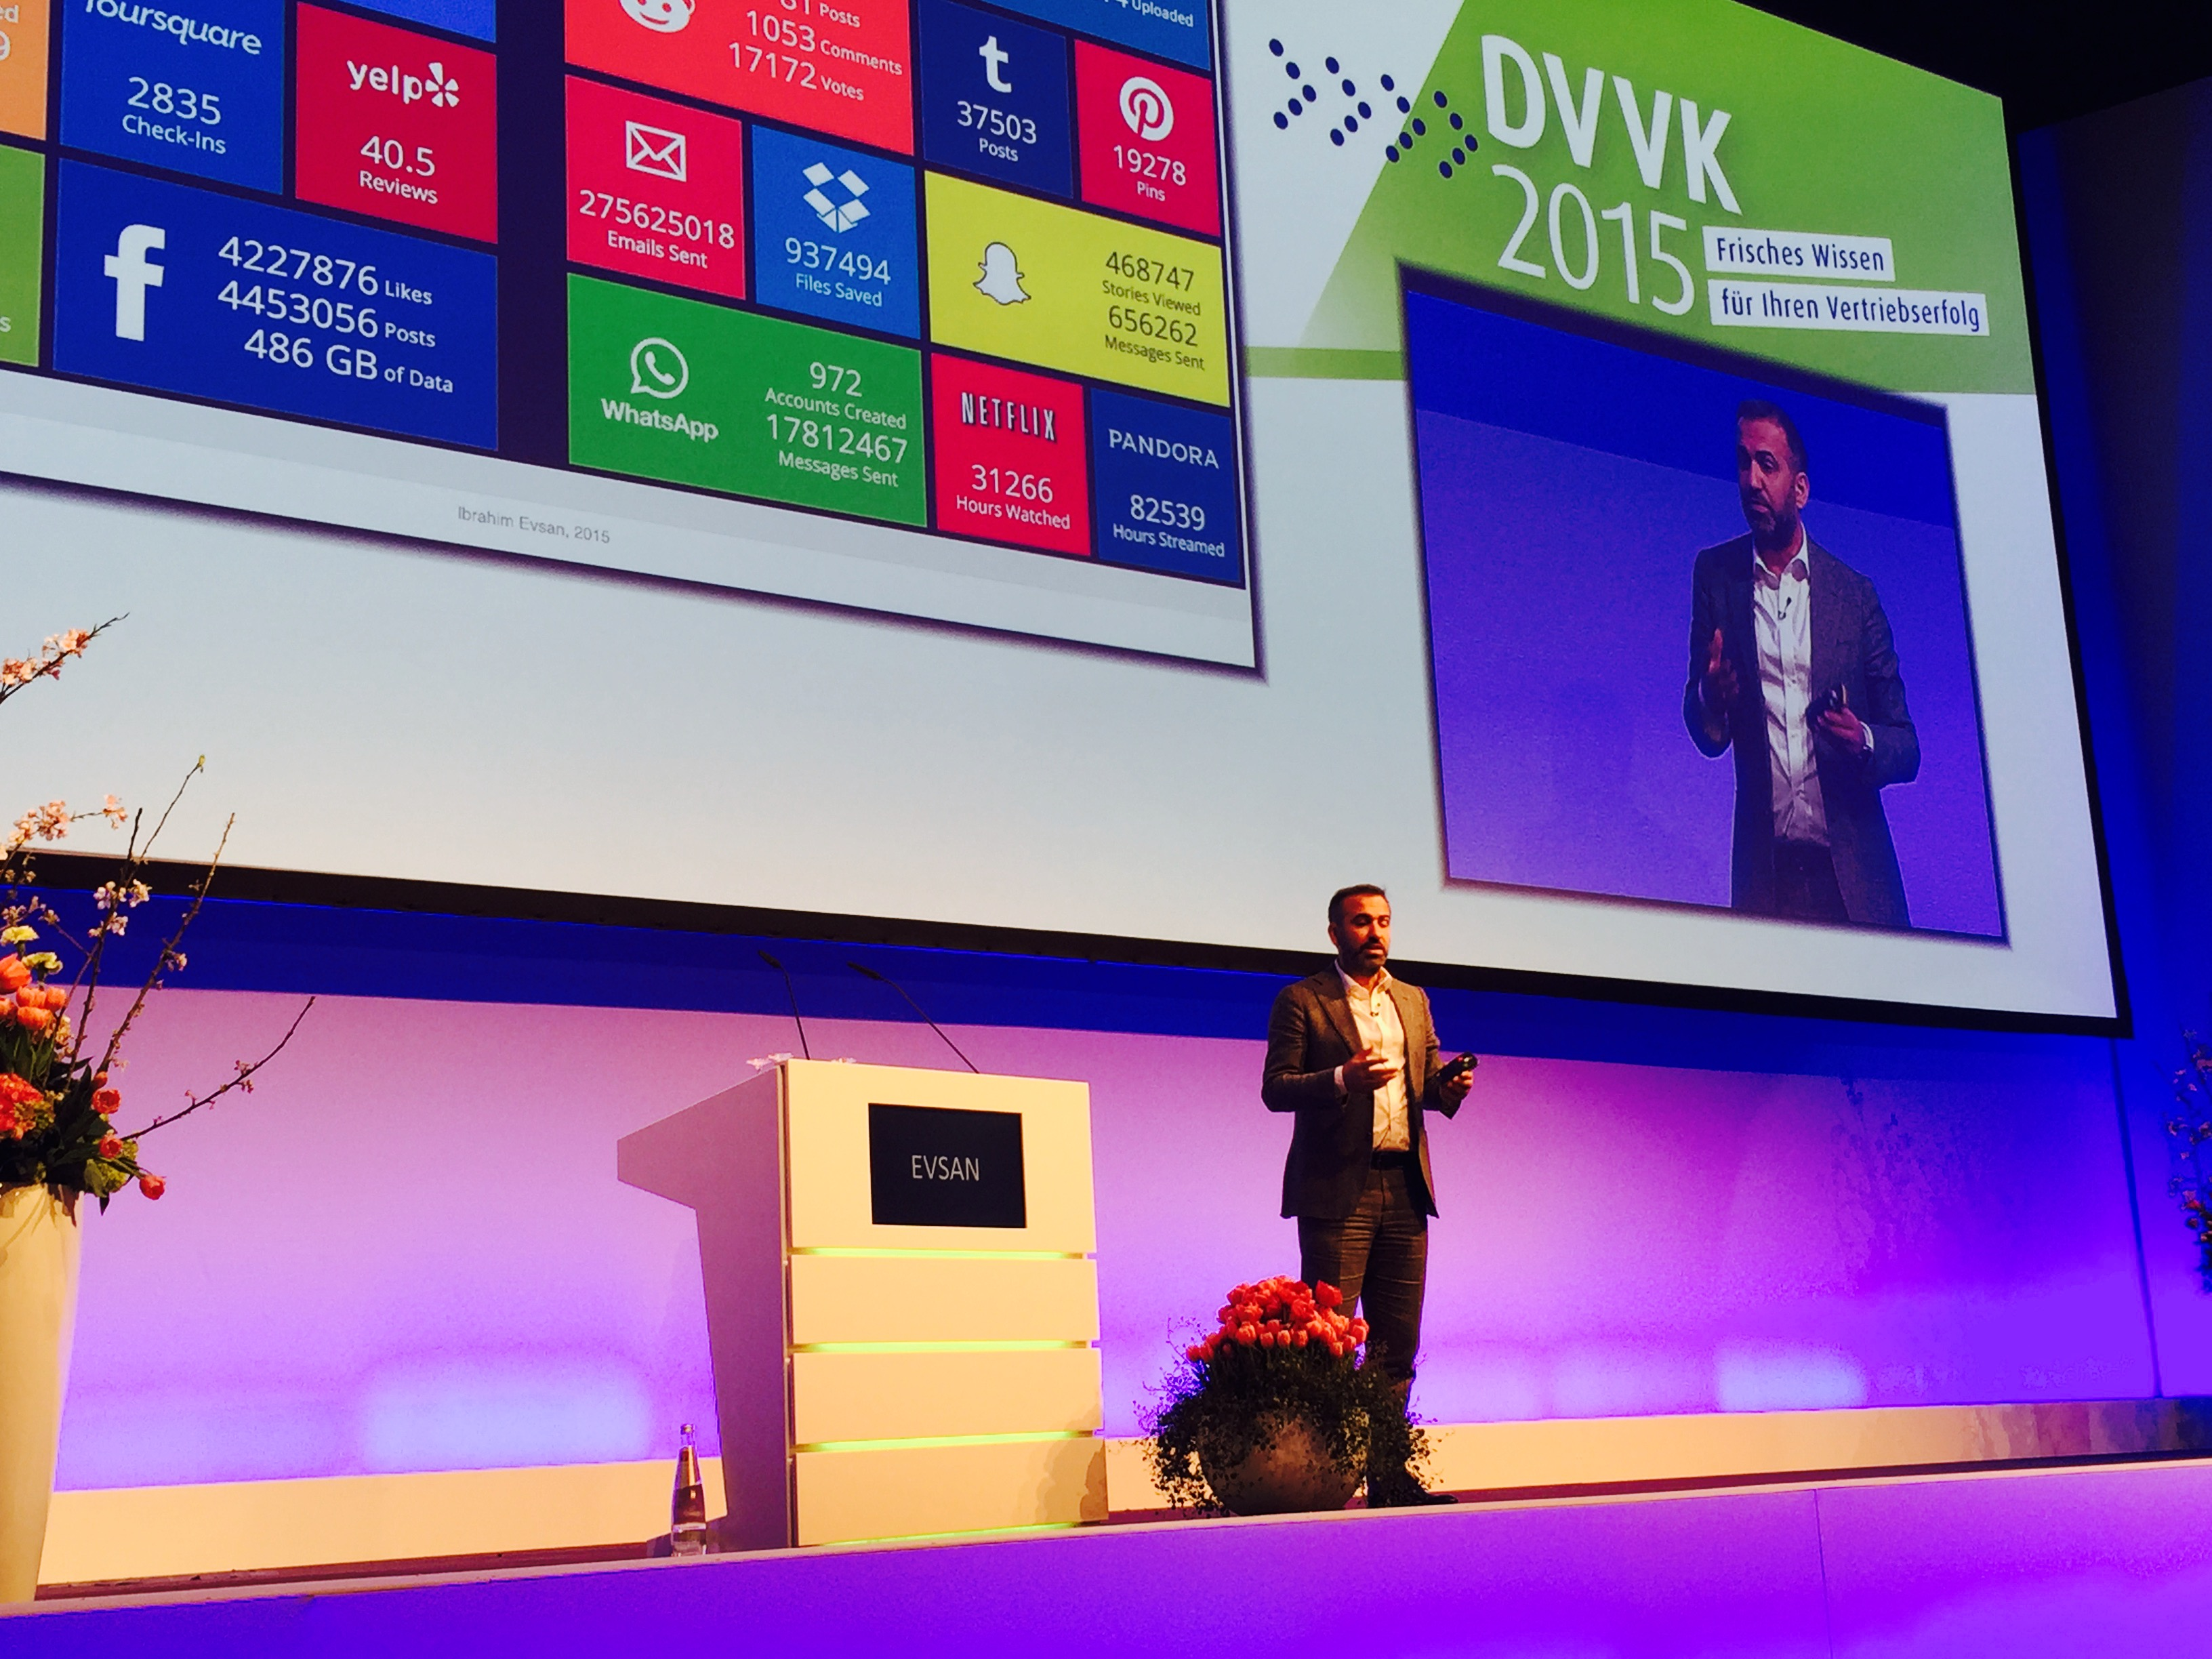 ocial Media Speaker Ibrahim Evsan auf der Bühne bei DVVK 2015